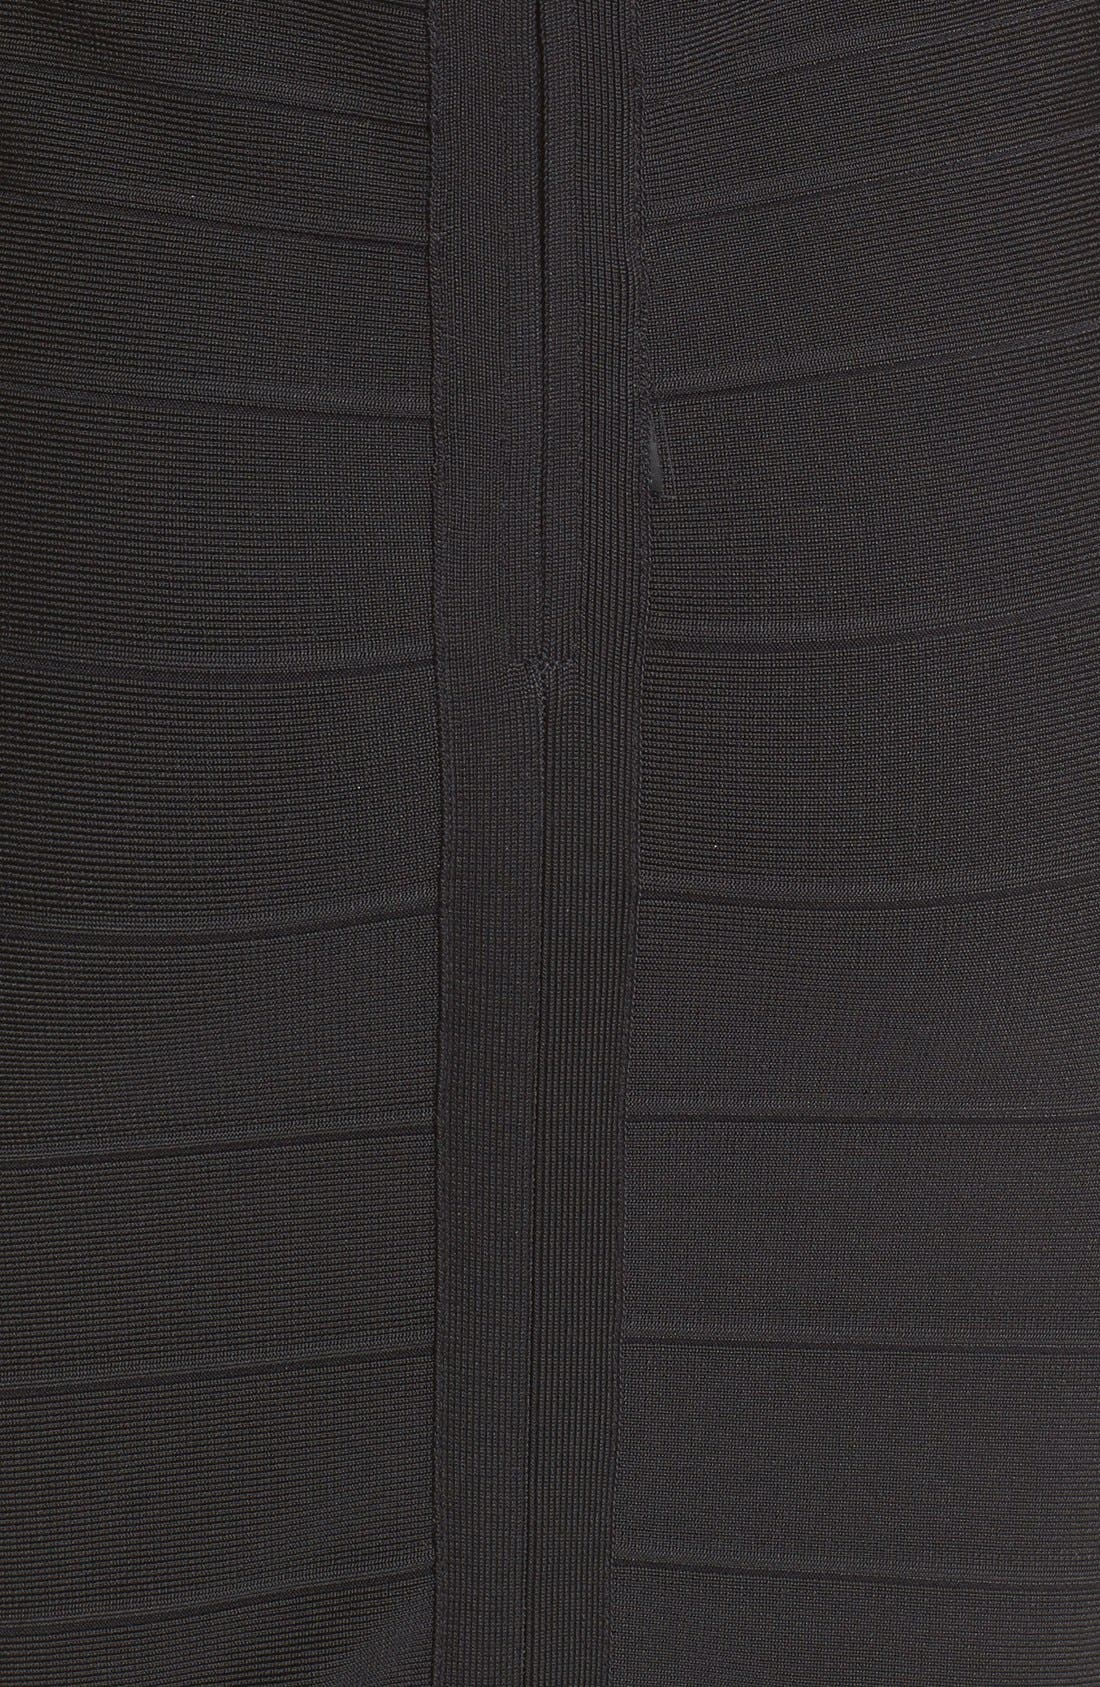 'Sydney' U-Neck Bandage Dress,                             Alternate thumbnail 3, color,                             001